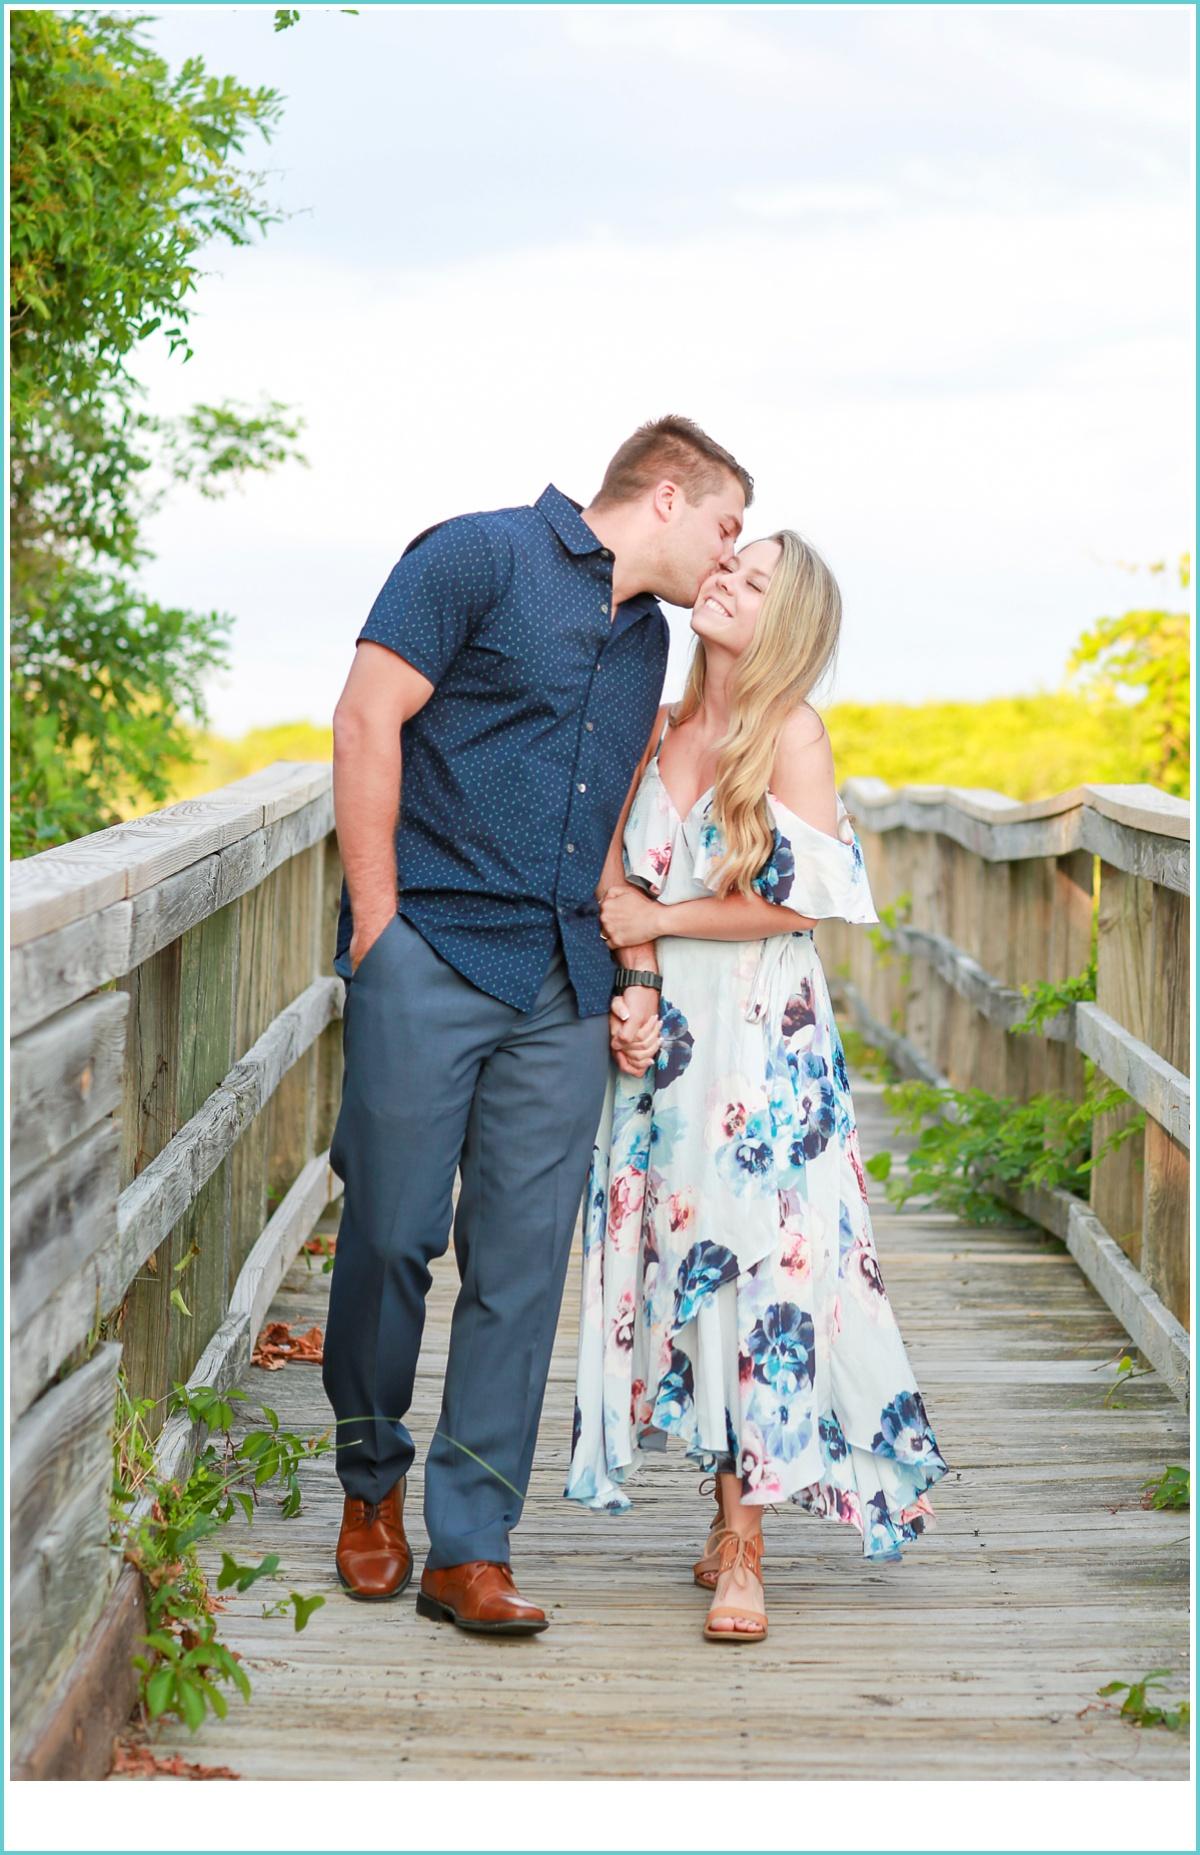 romantic walk during photo shoot